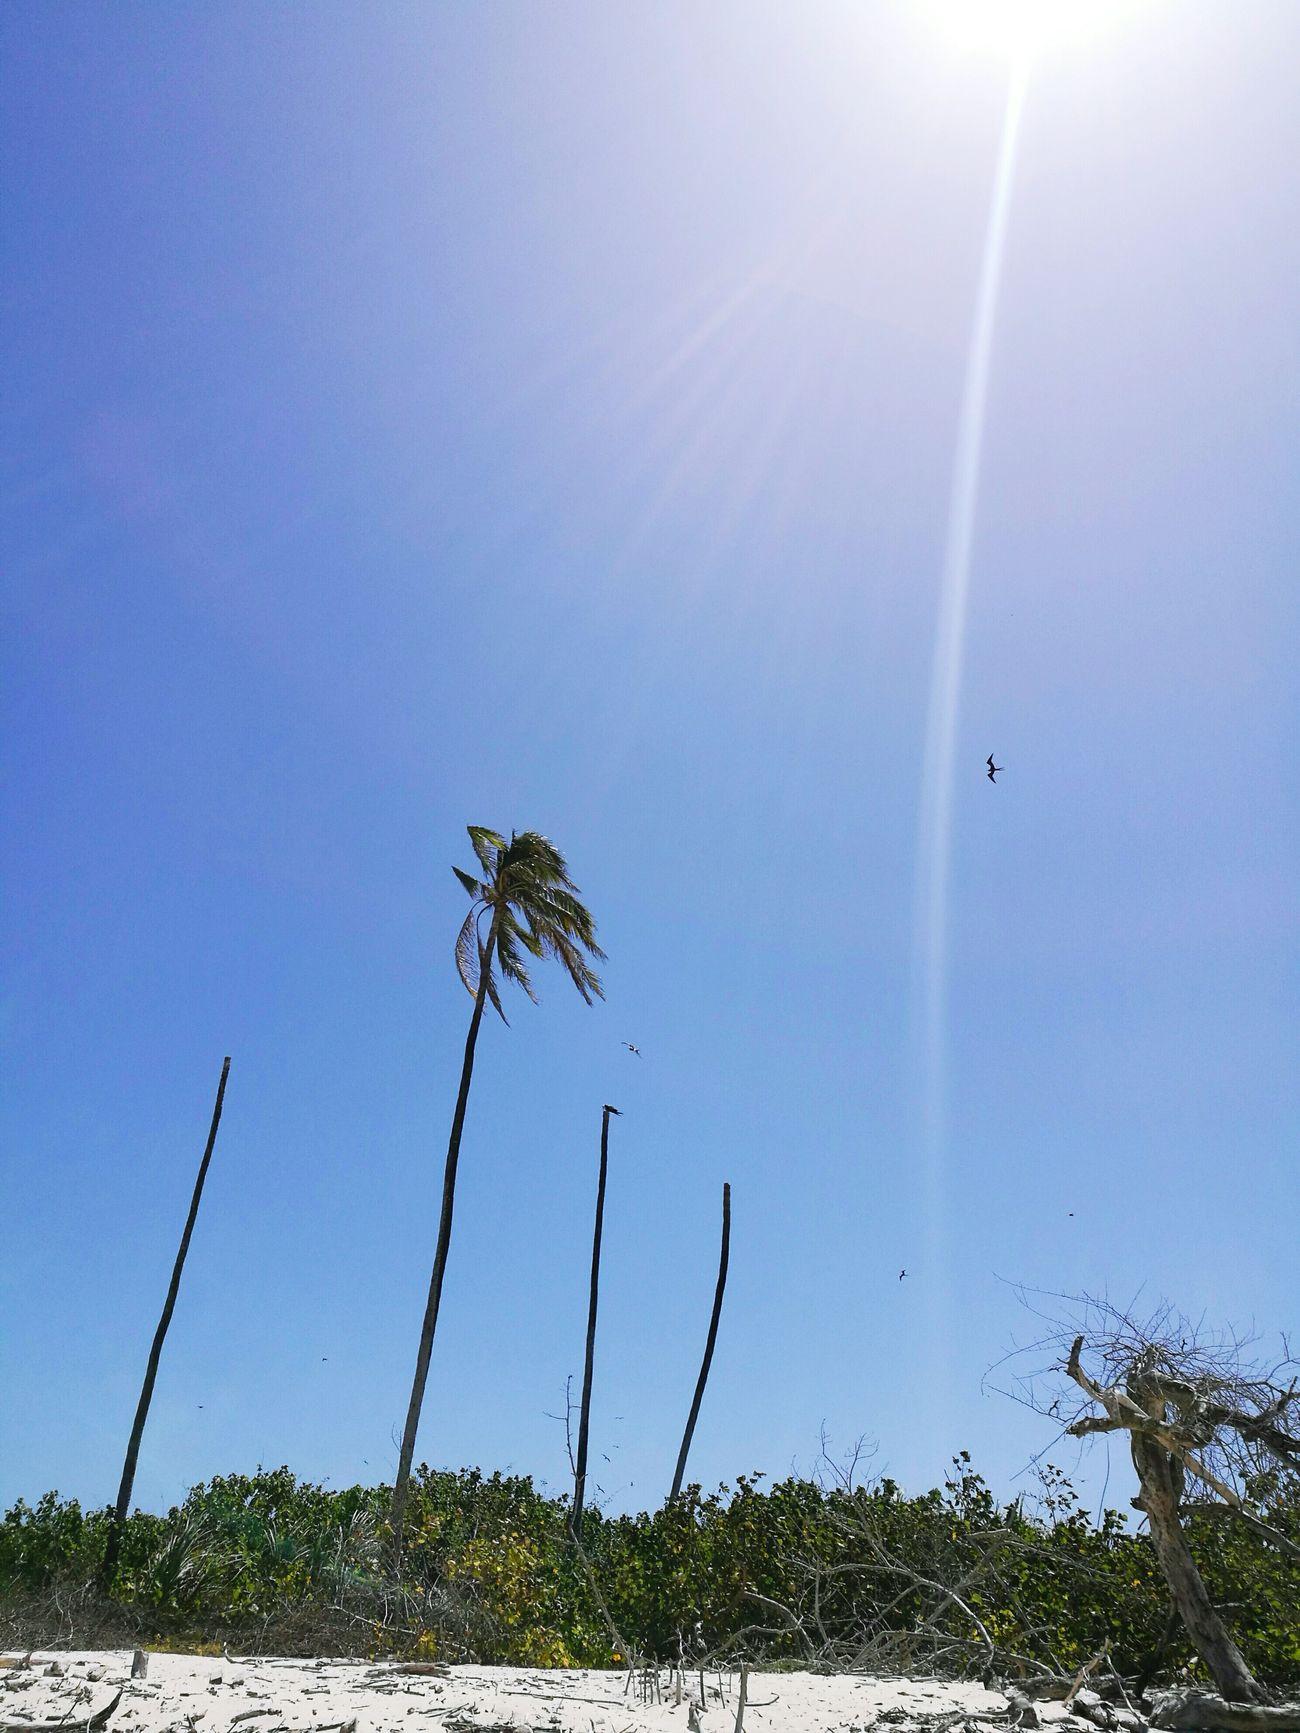 Verano Panama City Beach Nature_collection